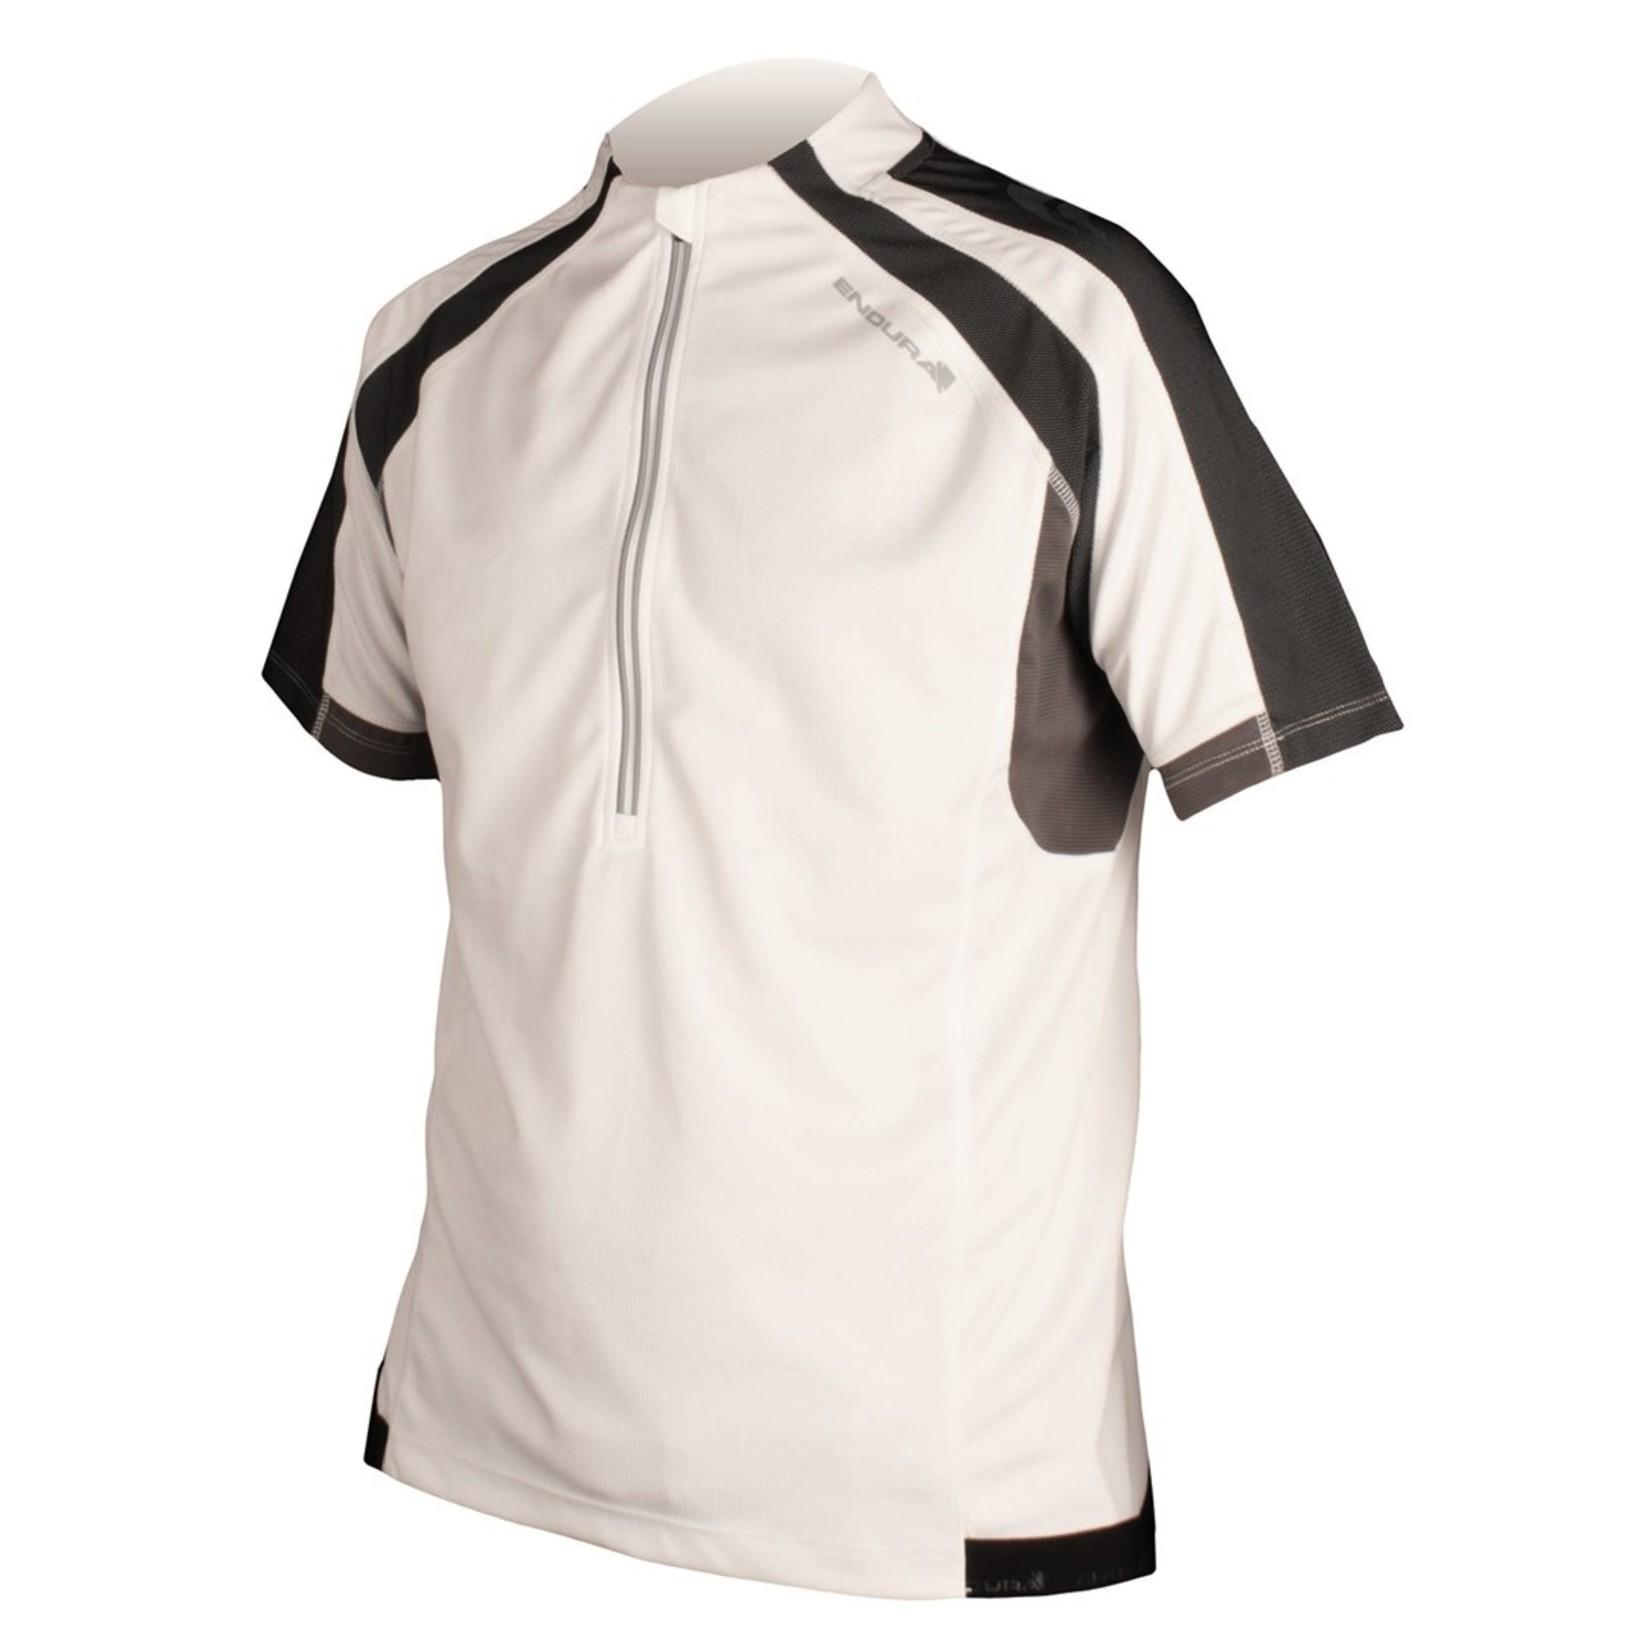 Endura Hummvee Short Sleeve Cycling Jersey White Small